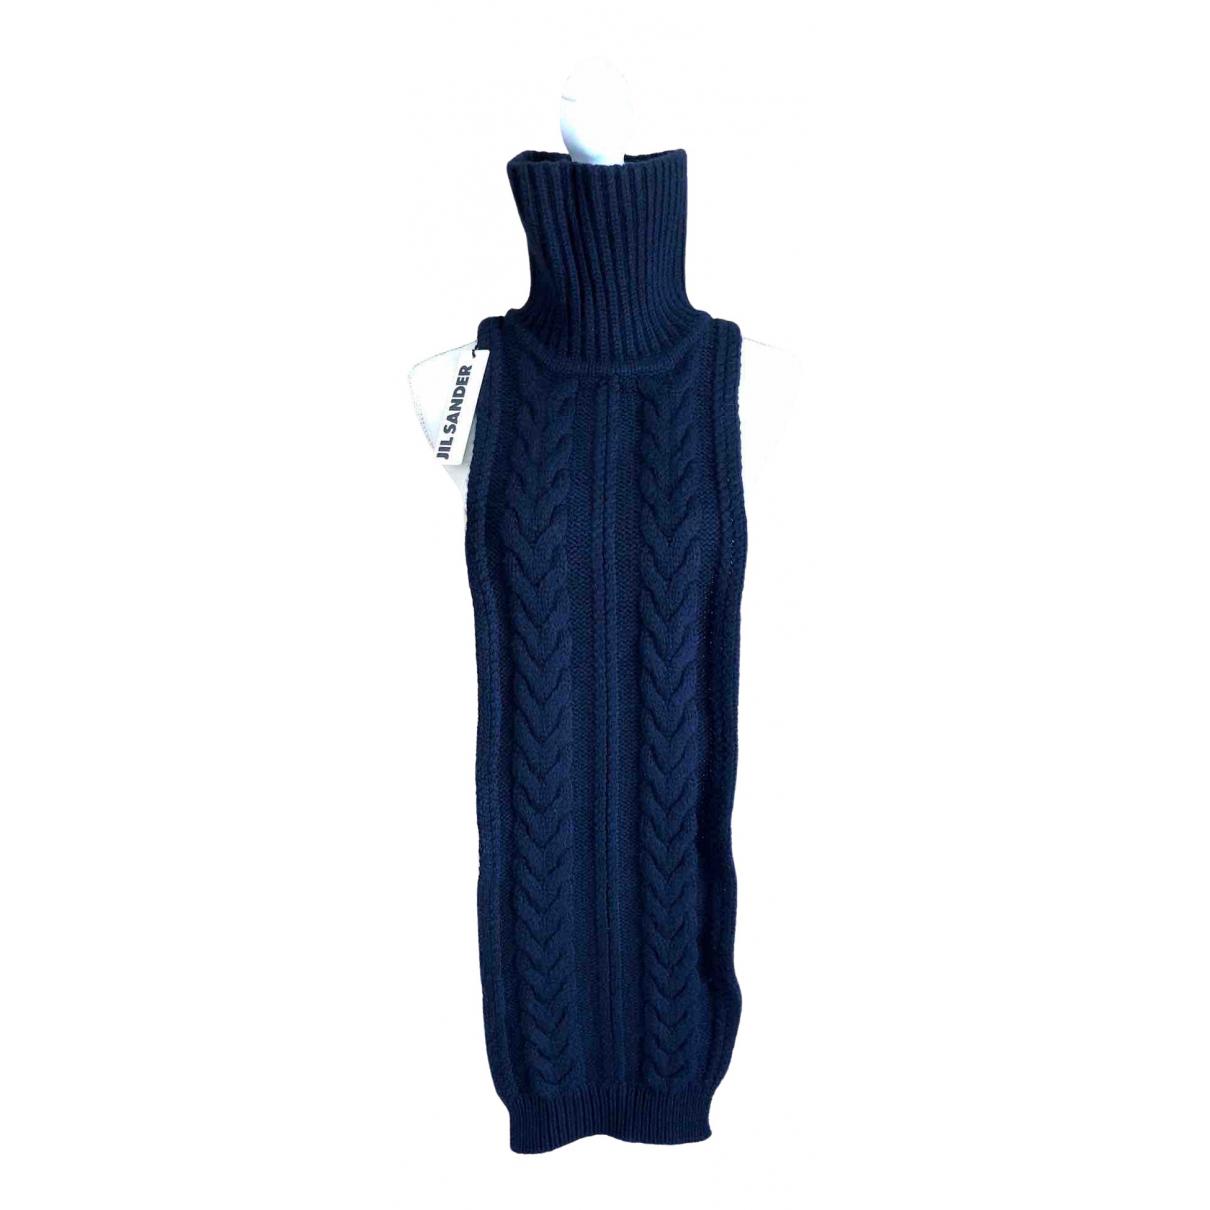 Jil Sander - Foulard   pour femme en laine - marine